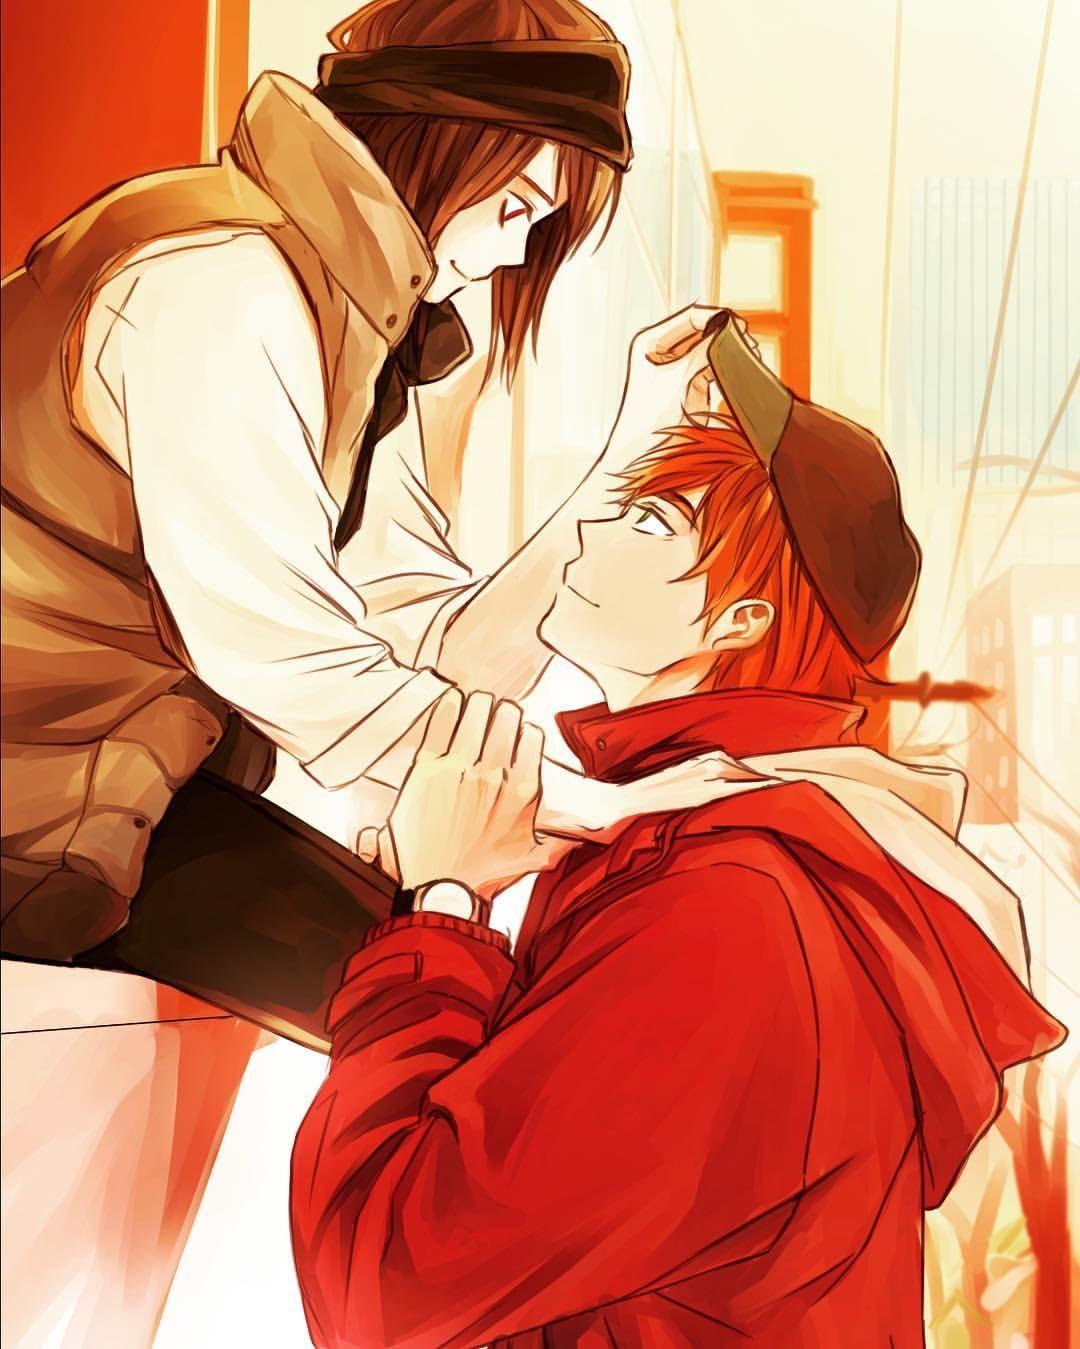 Manga Anime Romance Comics: Manhwa/Manhua/Webtoon